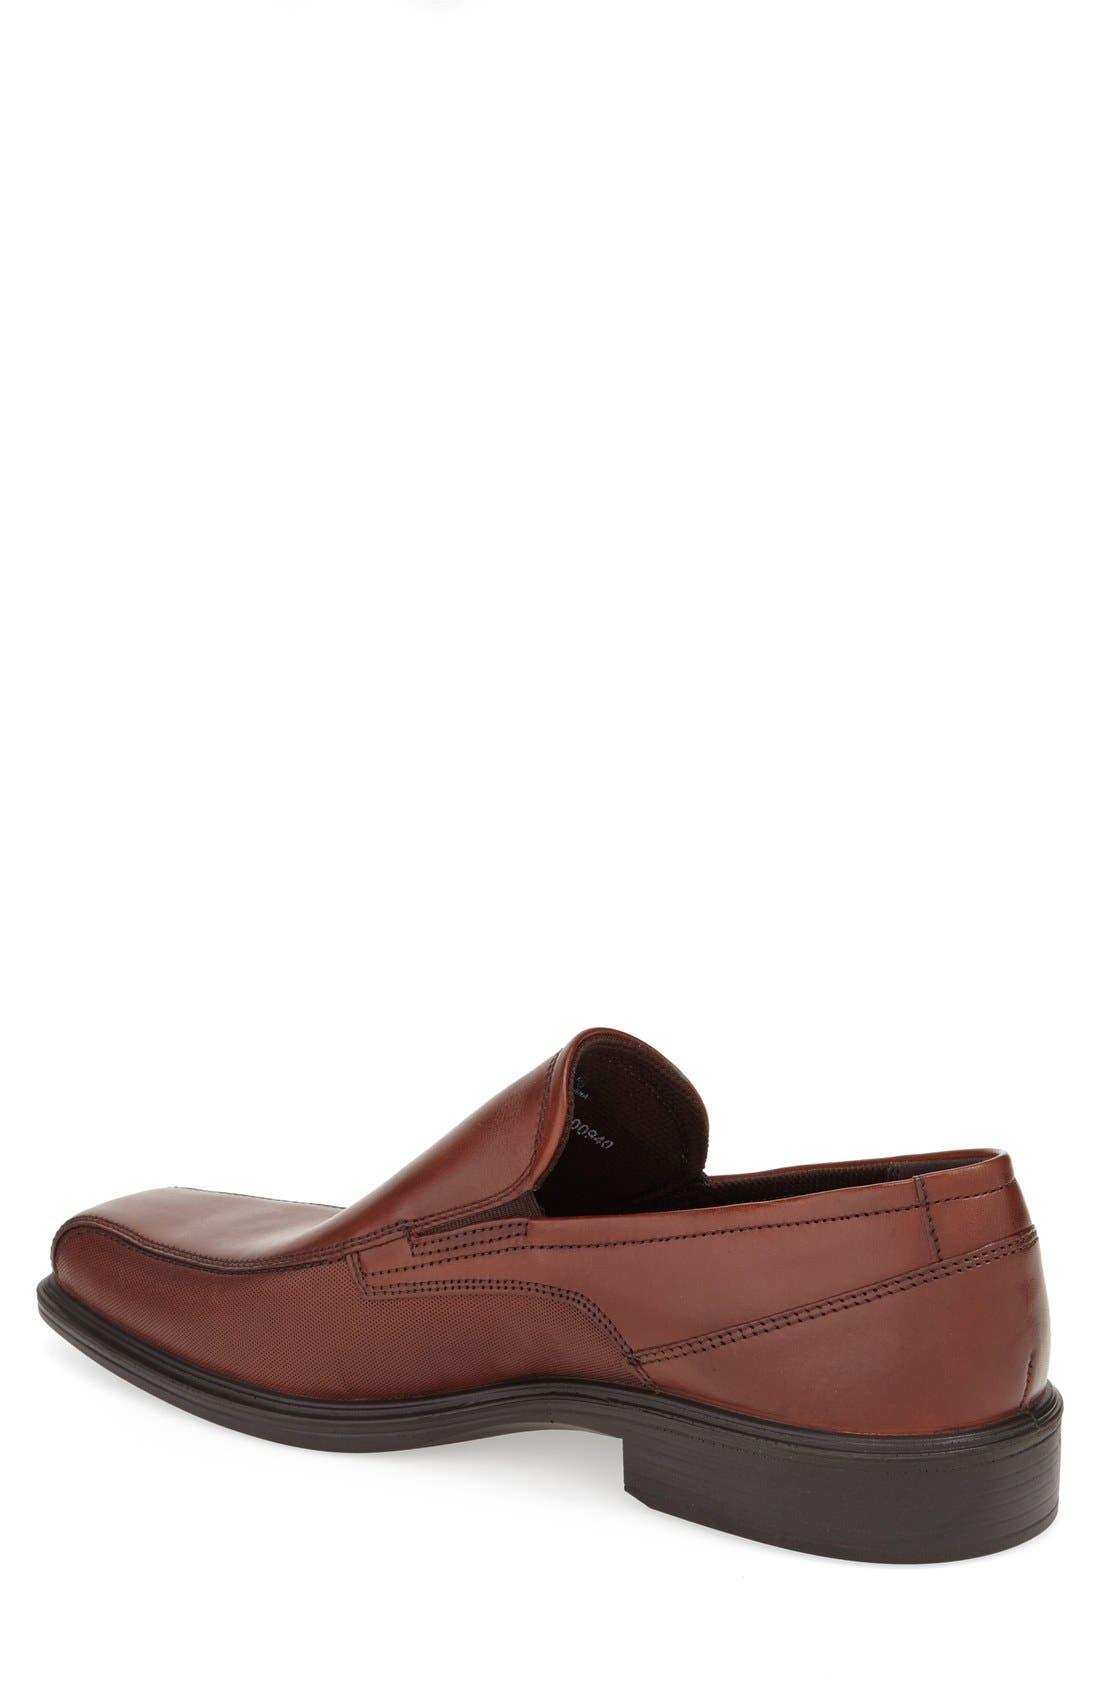 'Johannesburg' Venetian Loafer,                             Alternate thumbnail 2, color,                             Cognac Leather